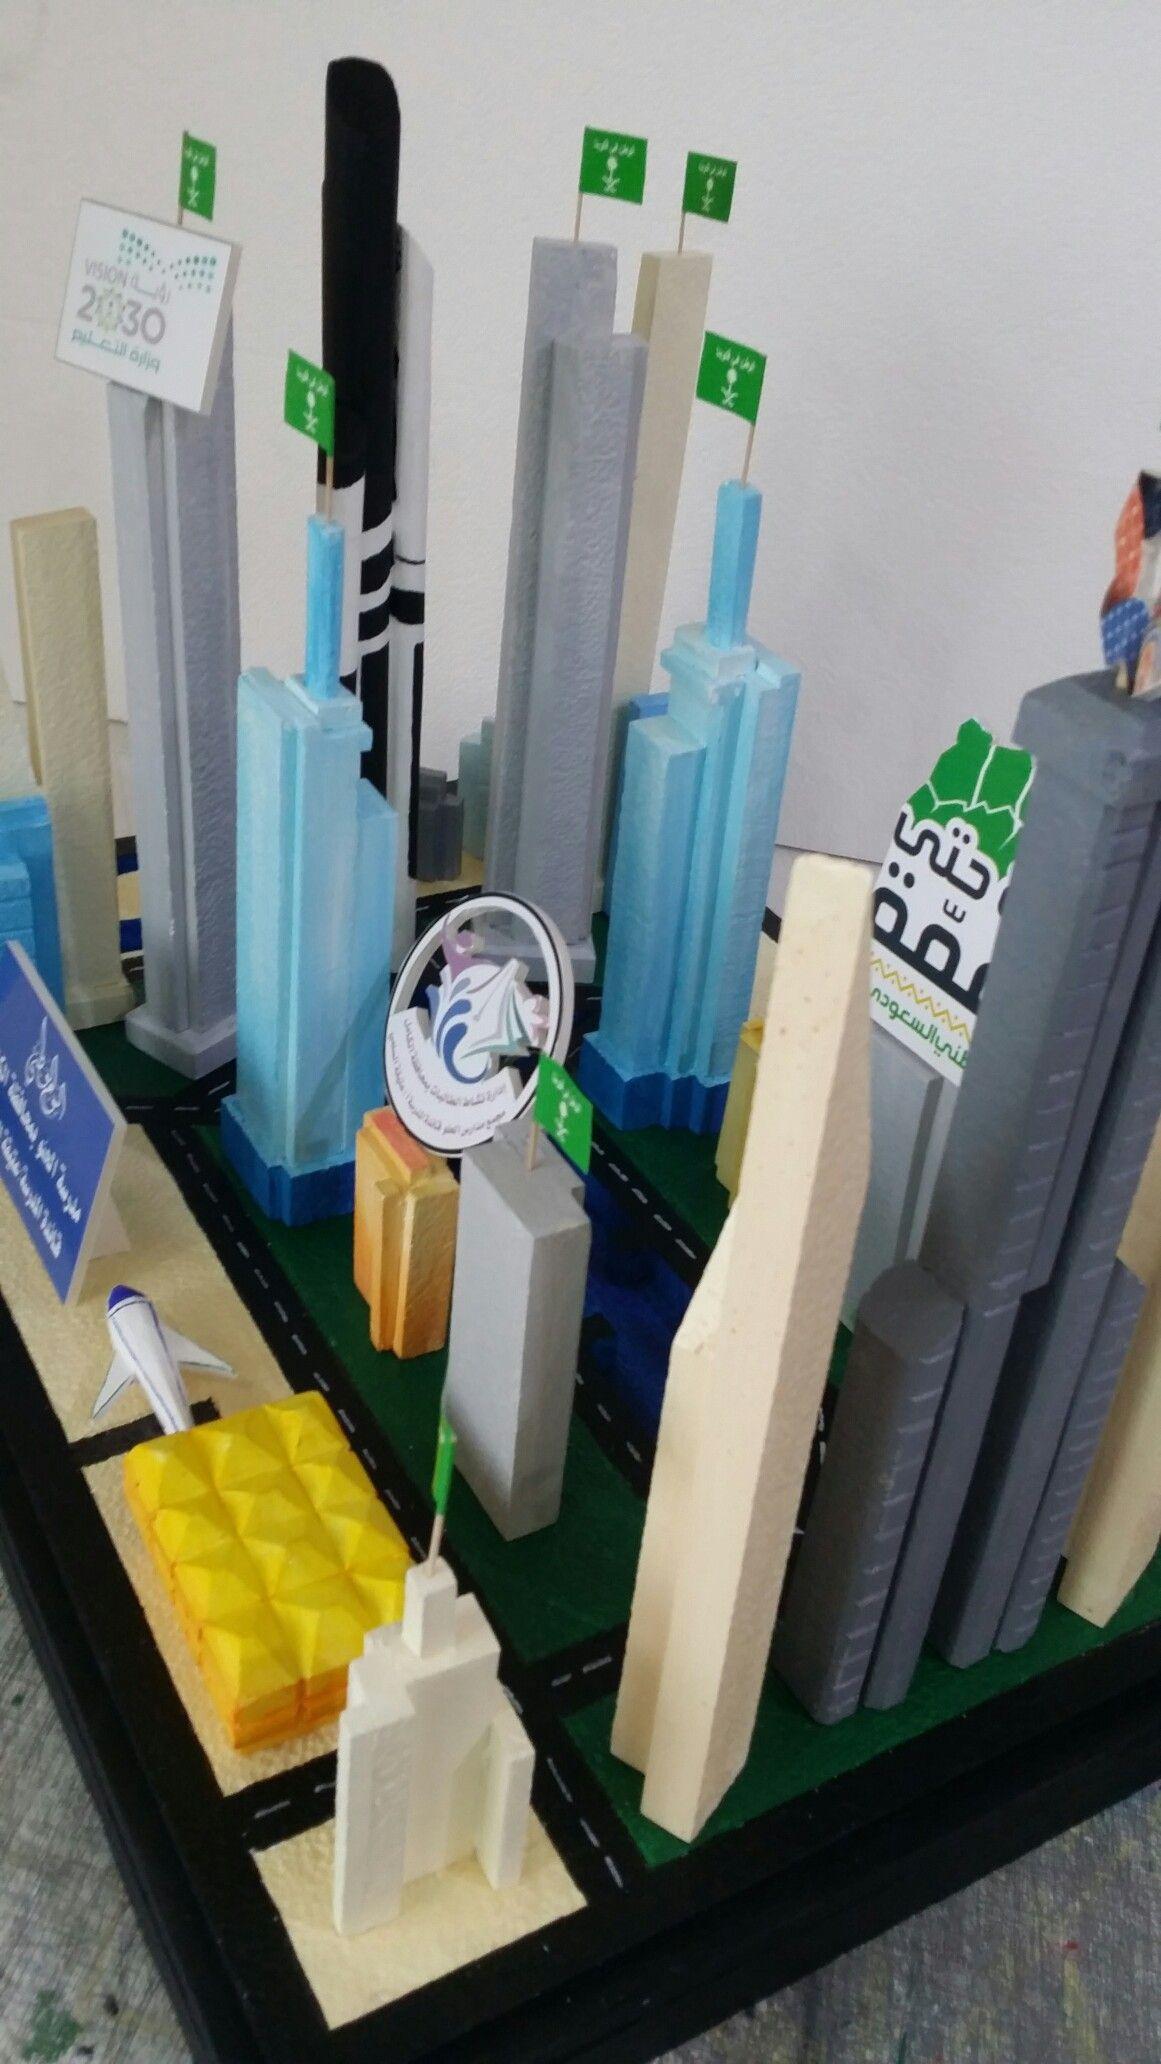 مجسم مدينة نيوم من أعمالي جدة مشروع نيوم Home Appliances Vacuum Vacuum Cleaner